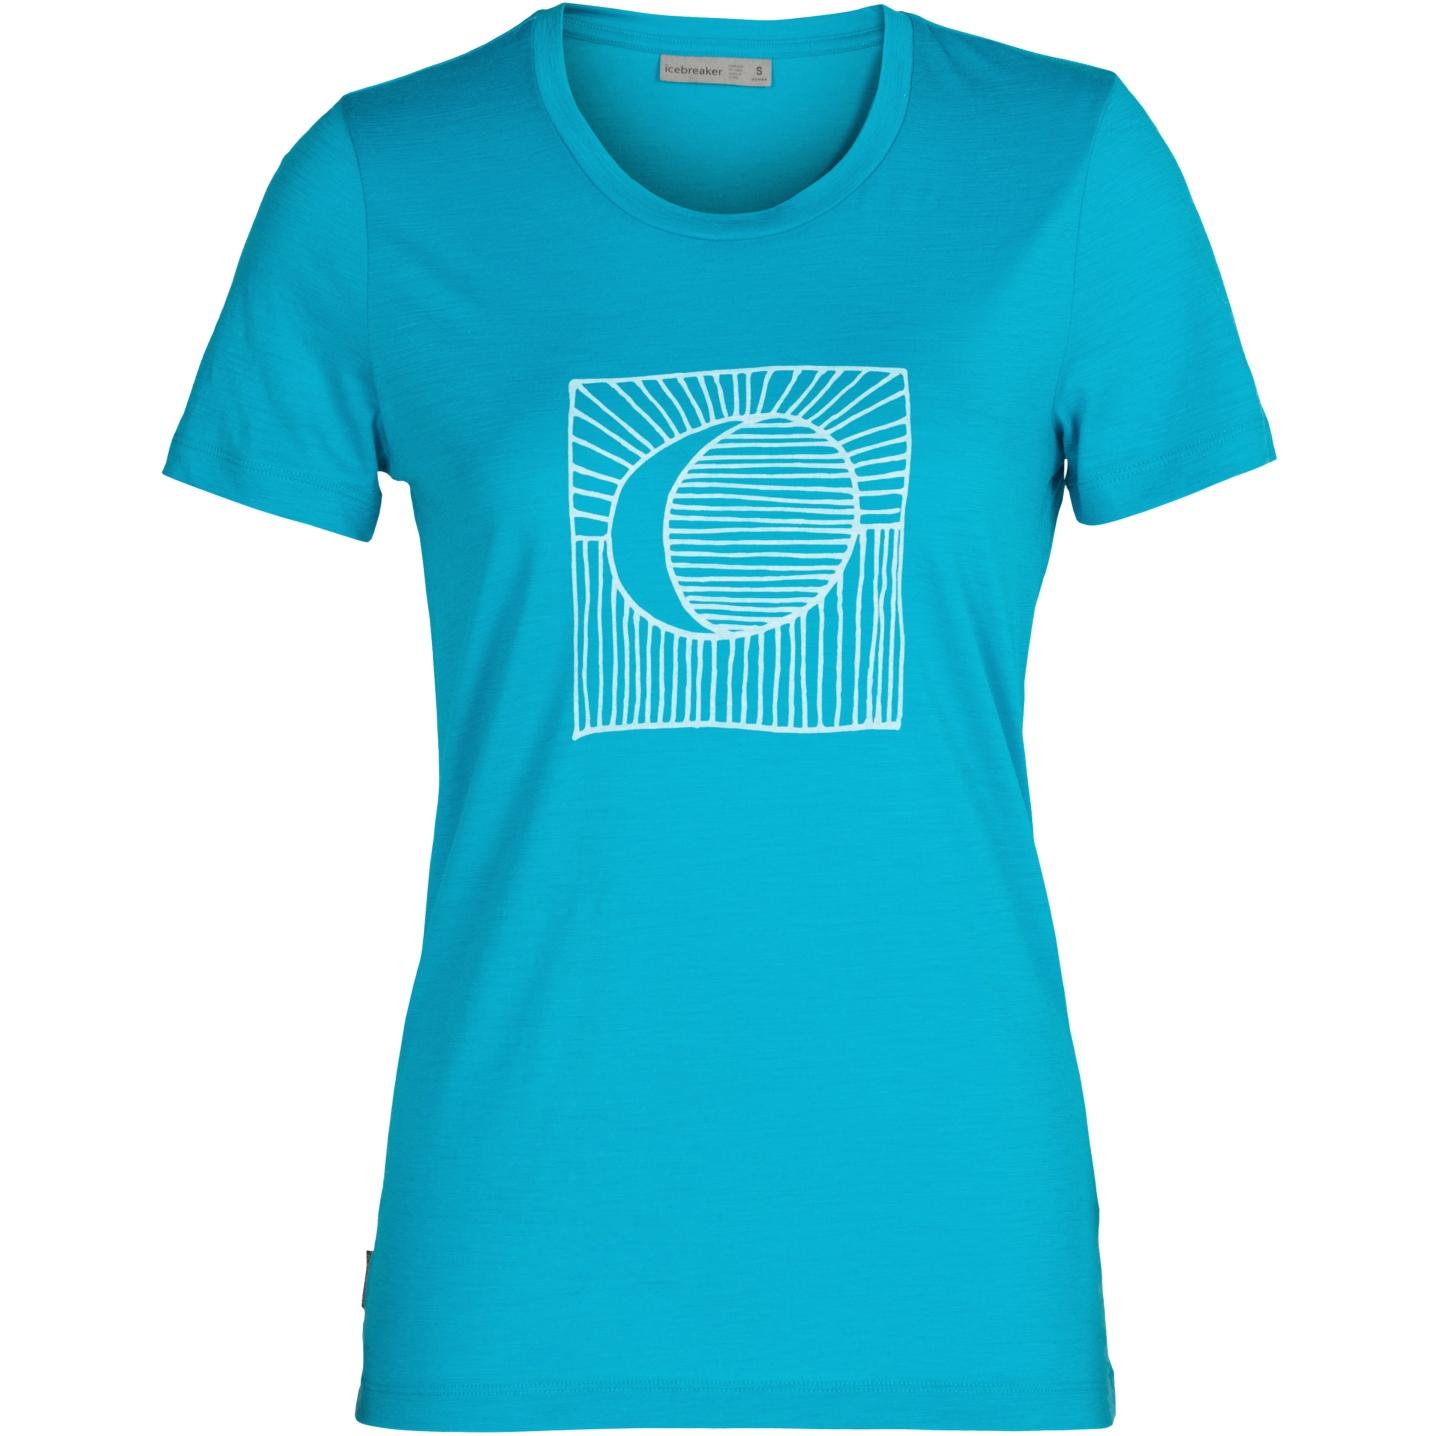 Produktbild von Icebreaker Tech Lite II Natures Orb Damen T-Shirt - Arctic Teal